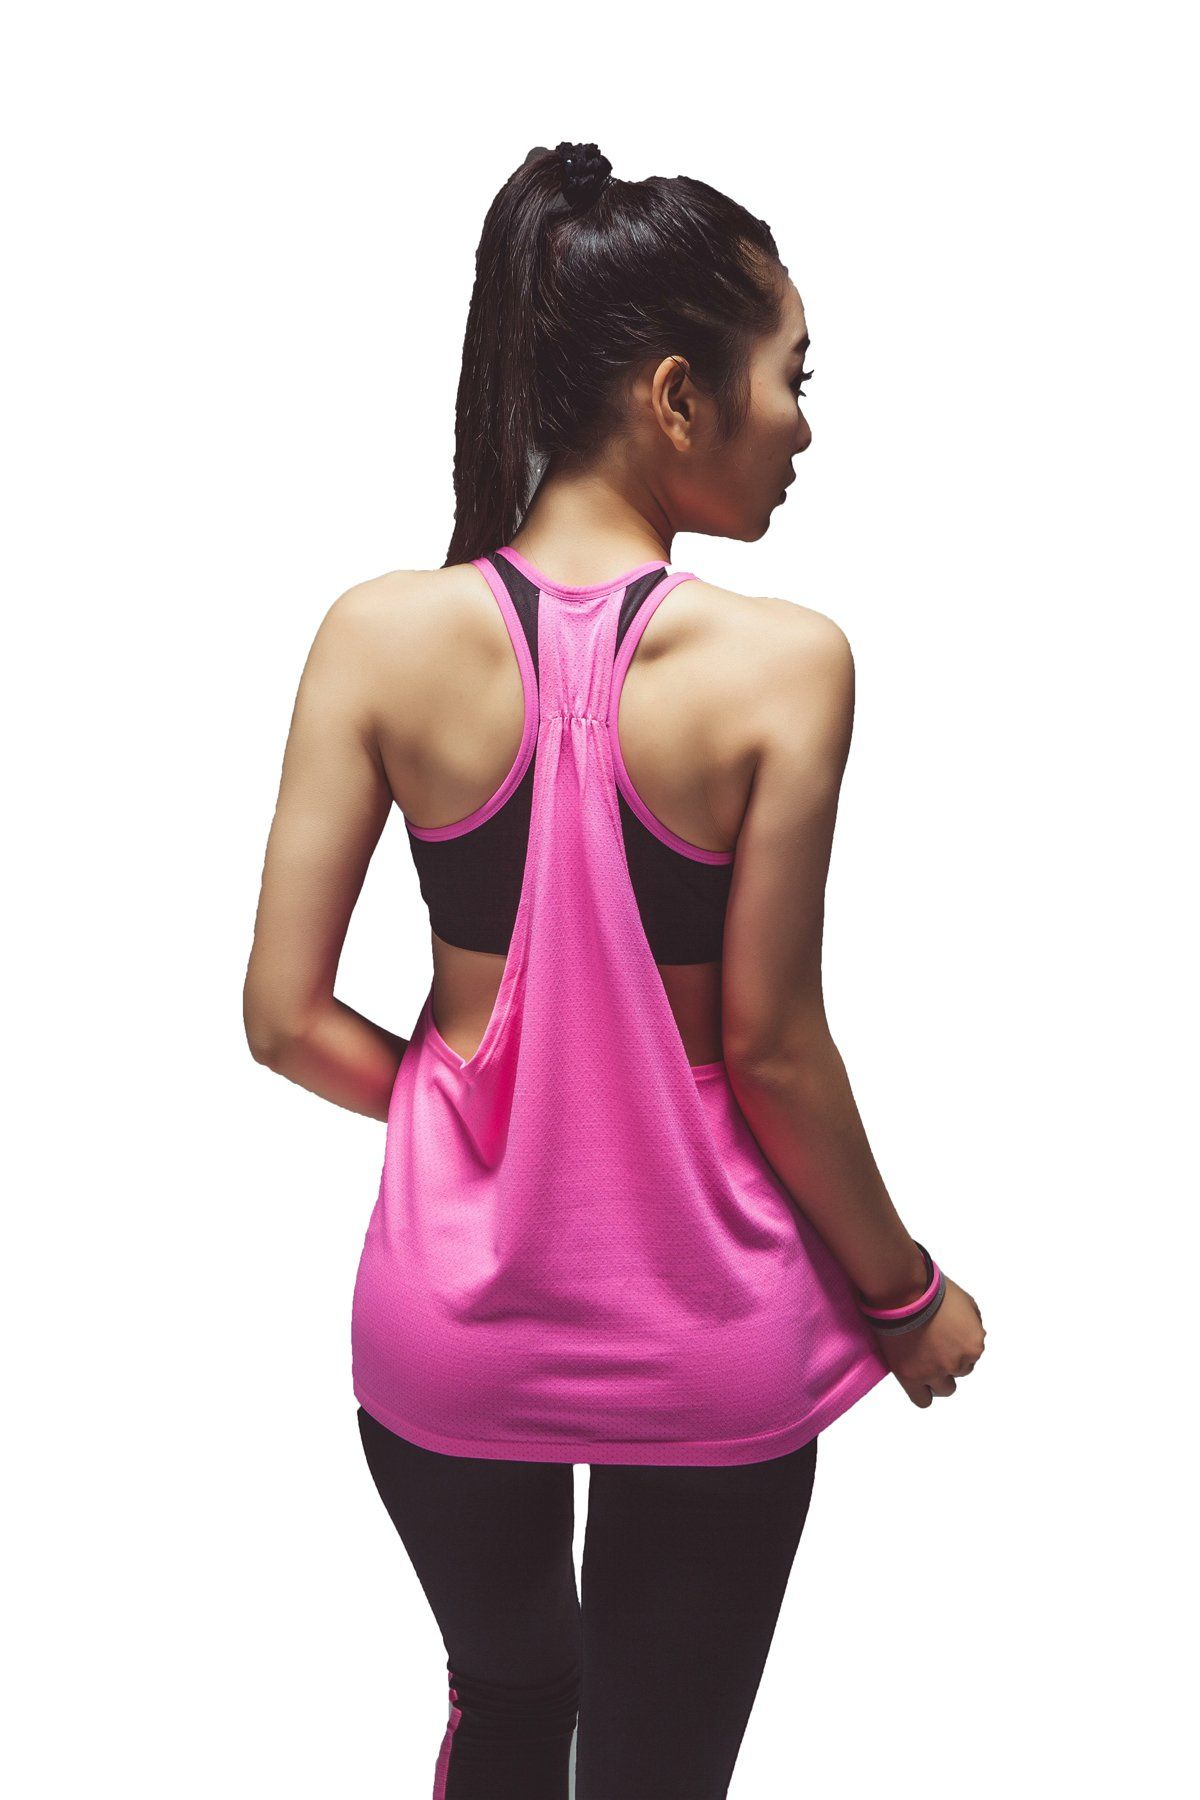 c05d4fa5a56a82 Women s Workout Yoga Crisscross Racerback Tank Tops with Build in Bra (L XL